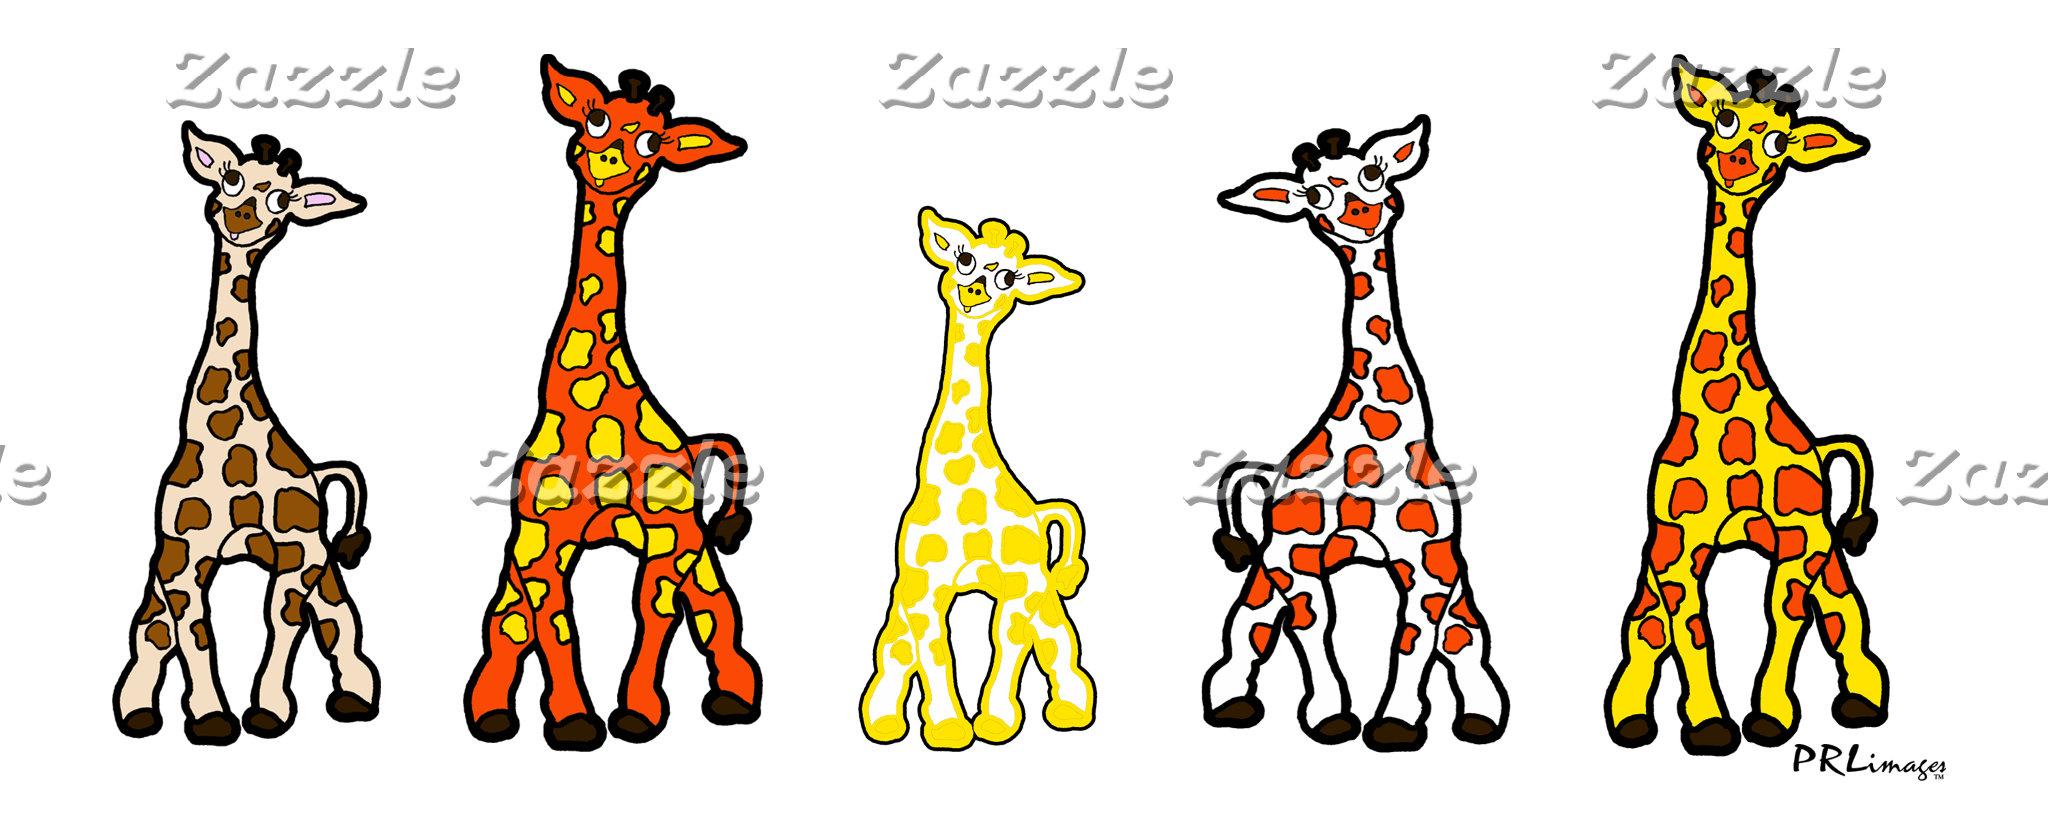 Baby Giraffes In A Row